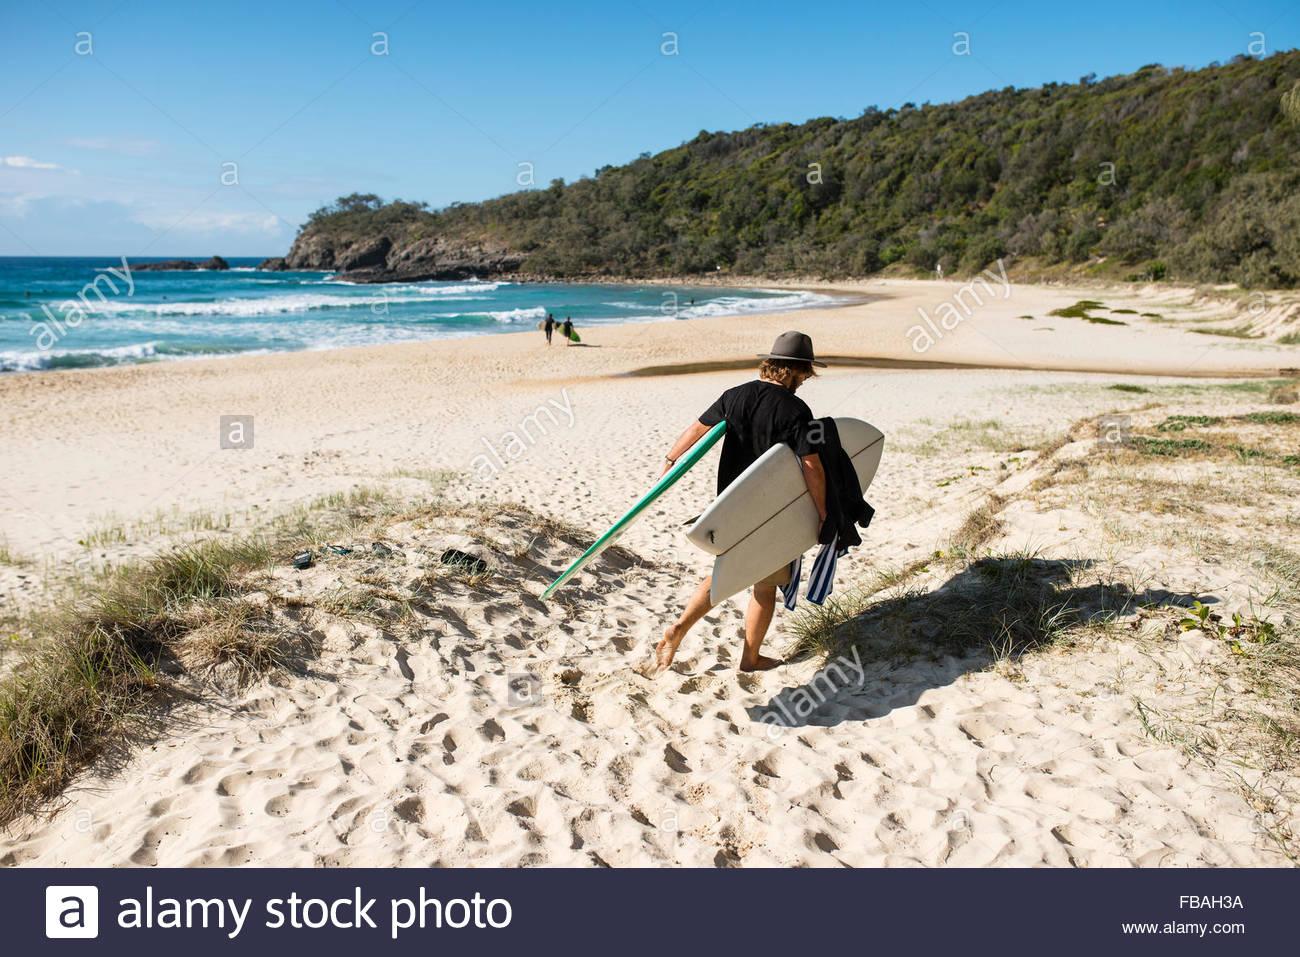 Australia, Queensland, Sunshine Coast, Noosa, Alexandria Bay, Young man carrying surfboards on beach - Stock Image